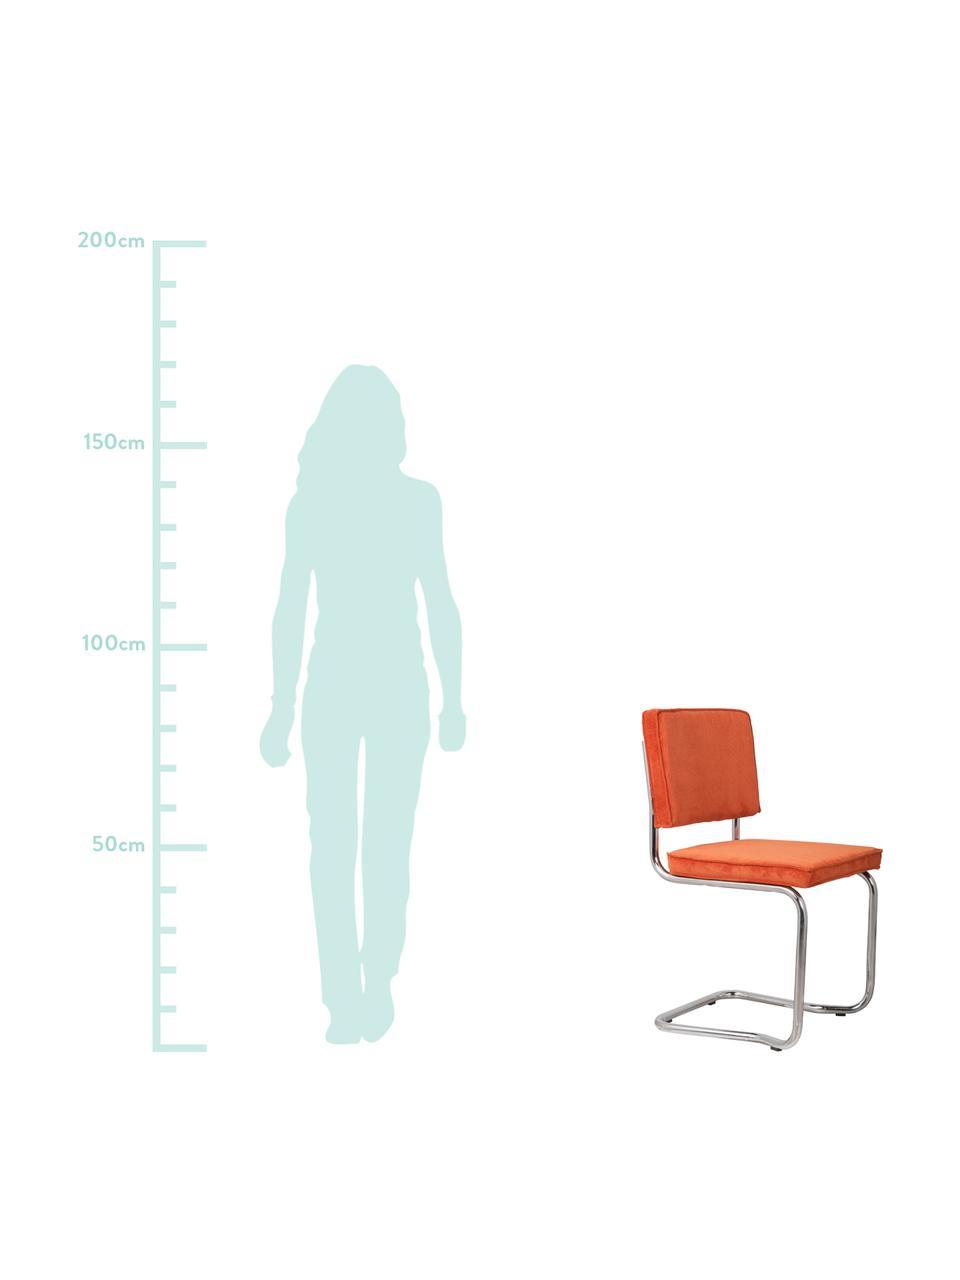 Corduroy cantilever stoel Kink, Bekleding: corduroy (88% nylon, 12% , Frame: verchroomd metaal, Poten: kunststof, Oranje, chroomkleurig, 48 x 48 cm